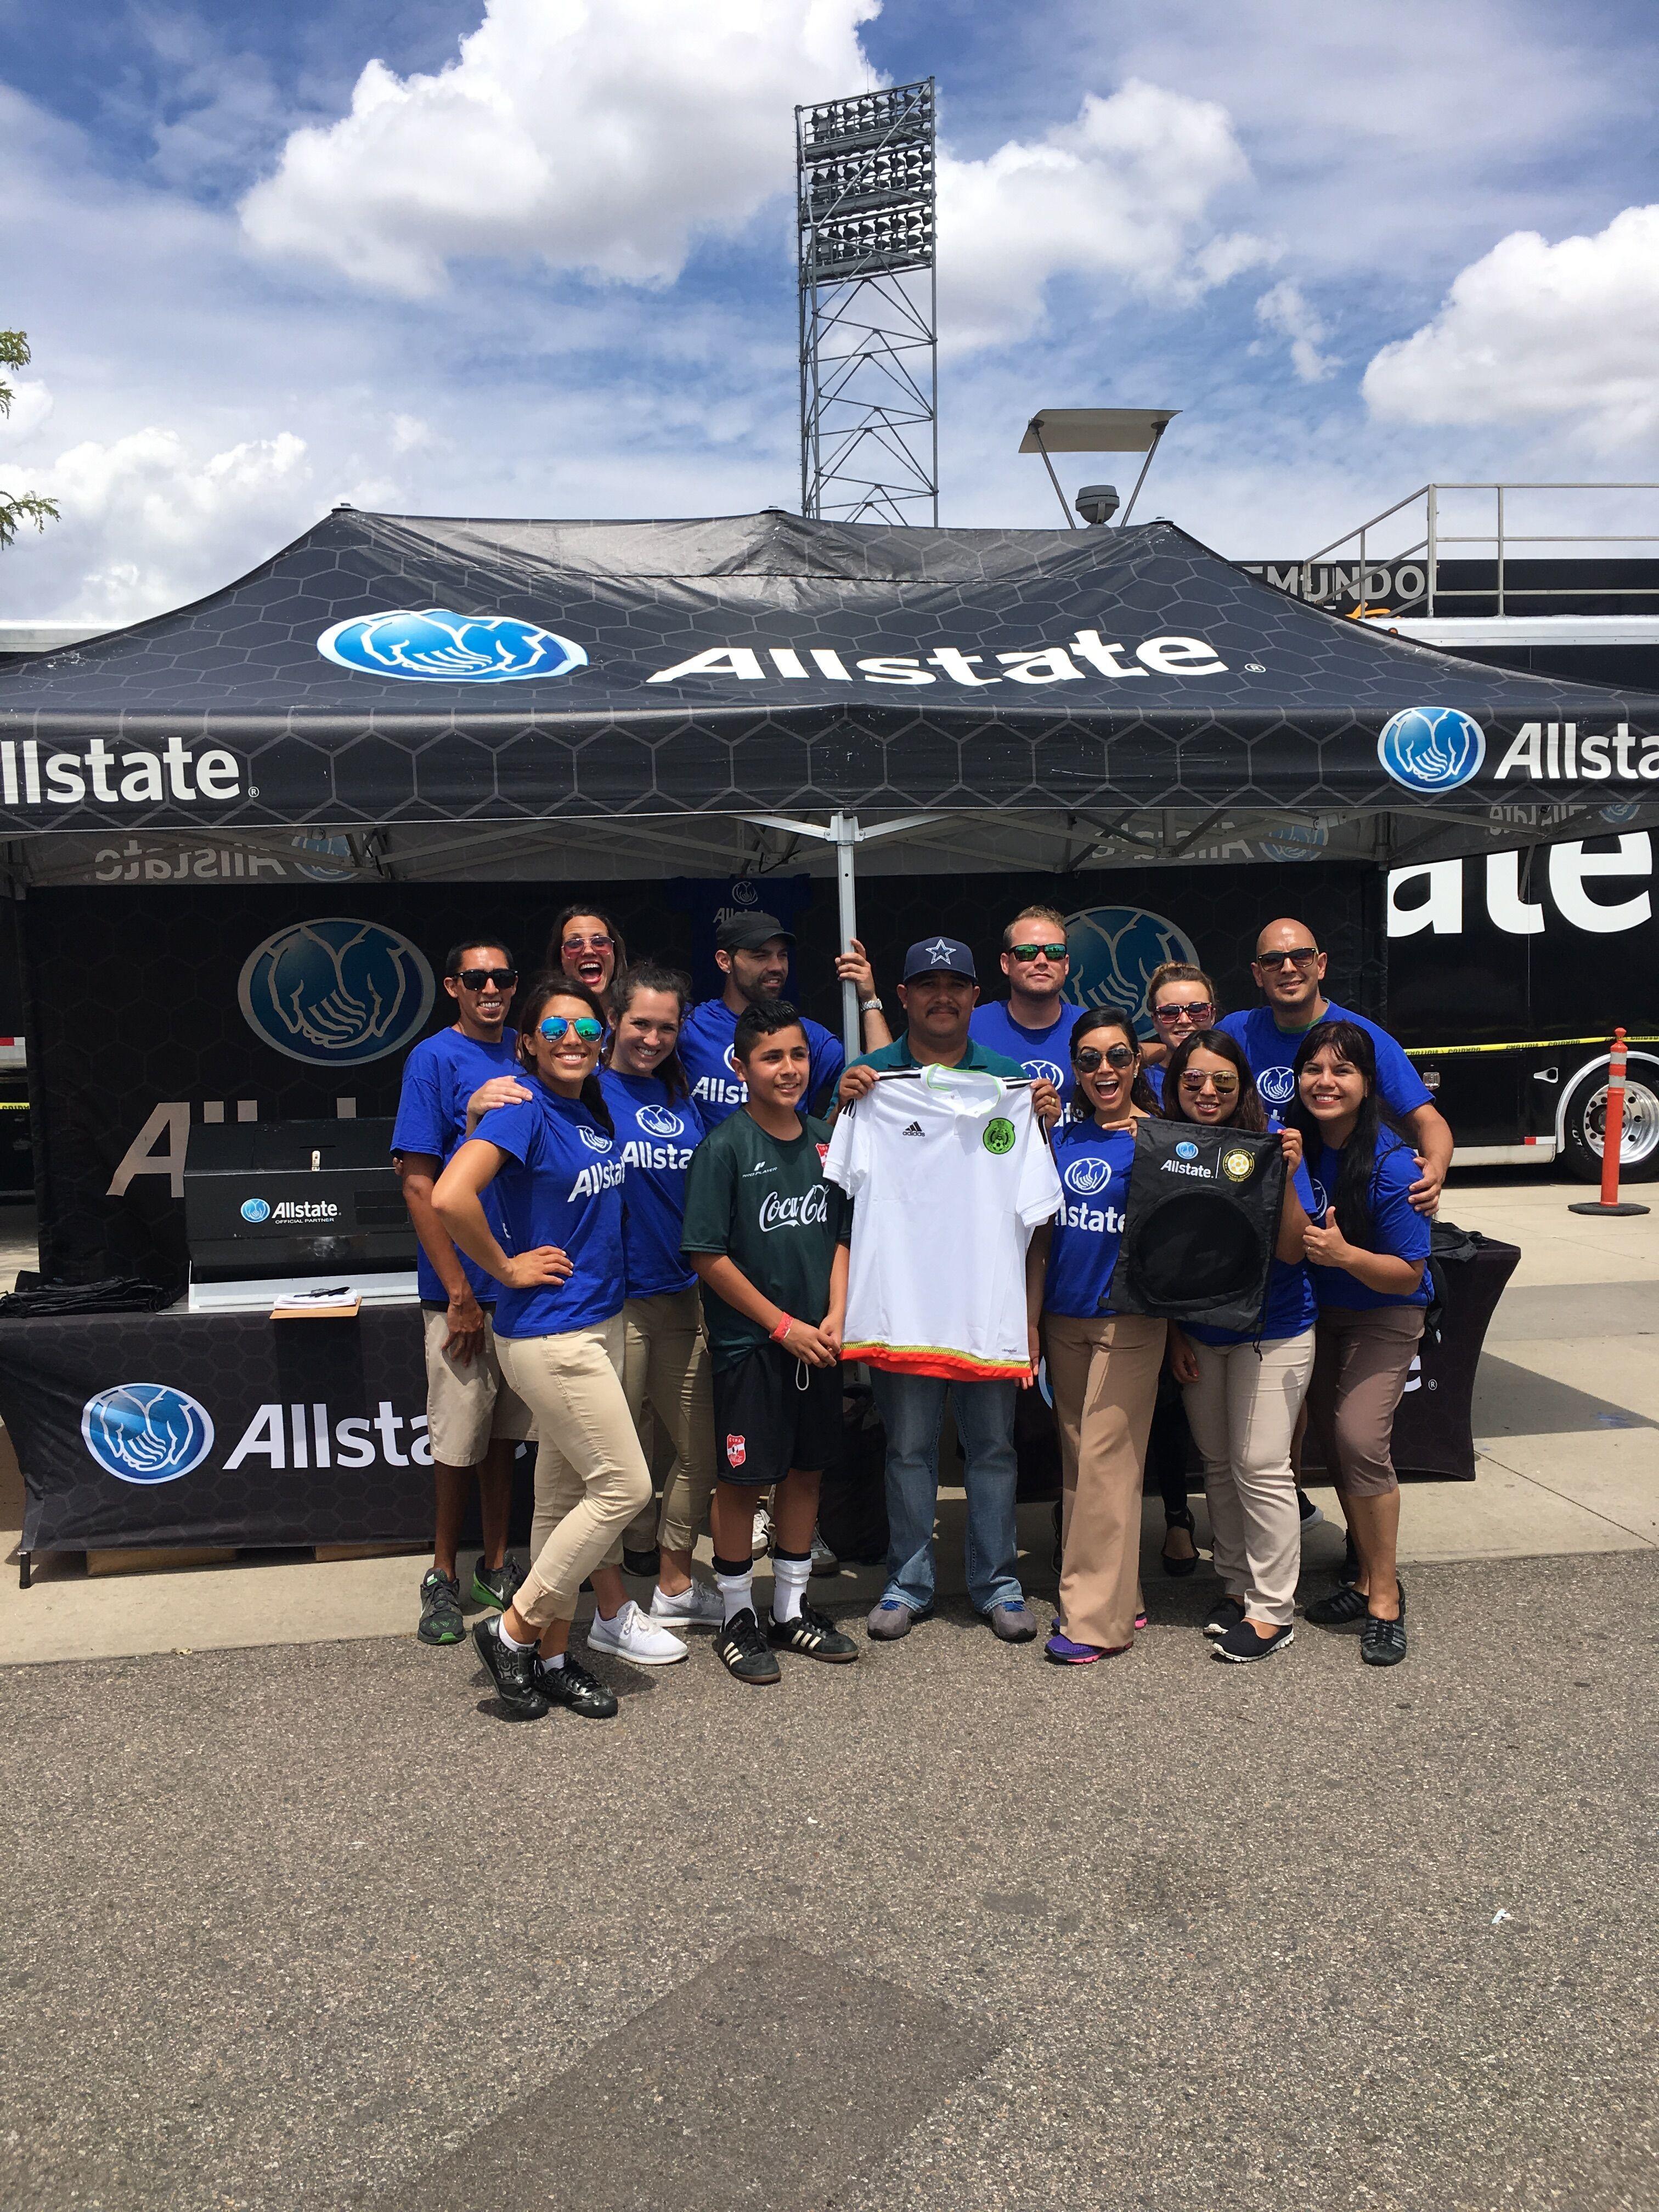 Juanita K. Martin: Allstate Insurance image 29